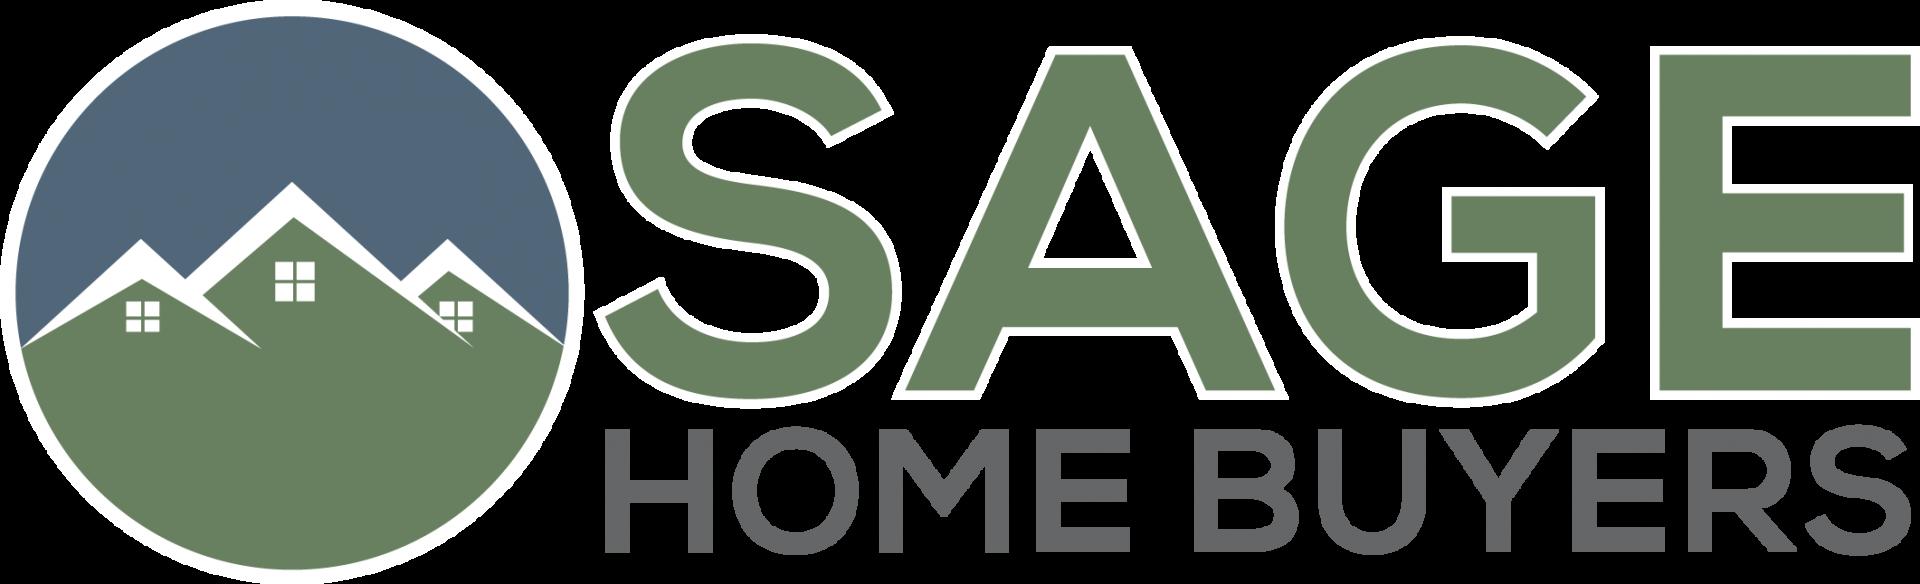 Sage Home Buyers  logo